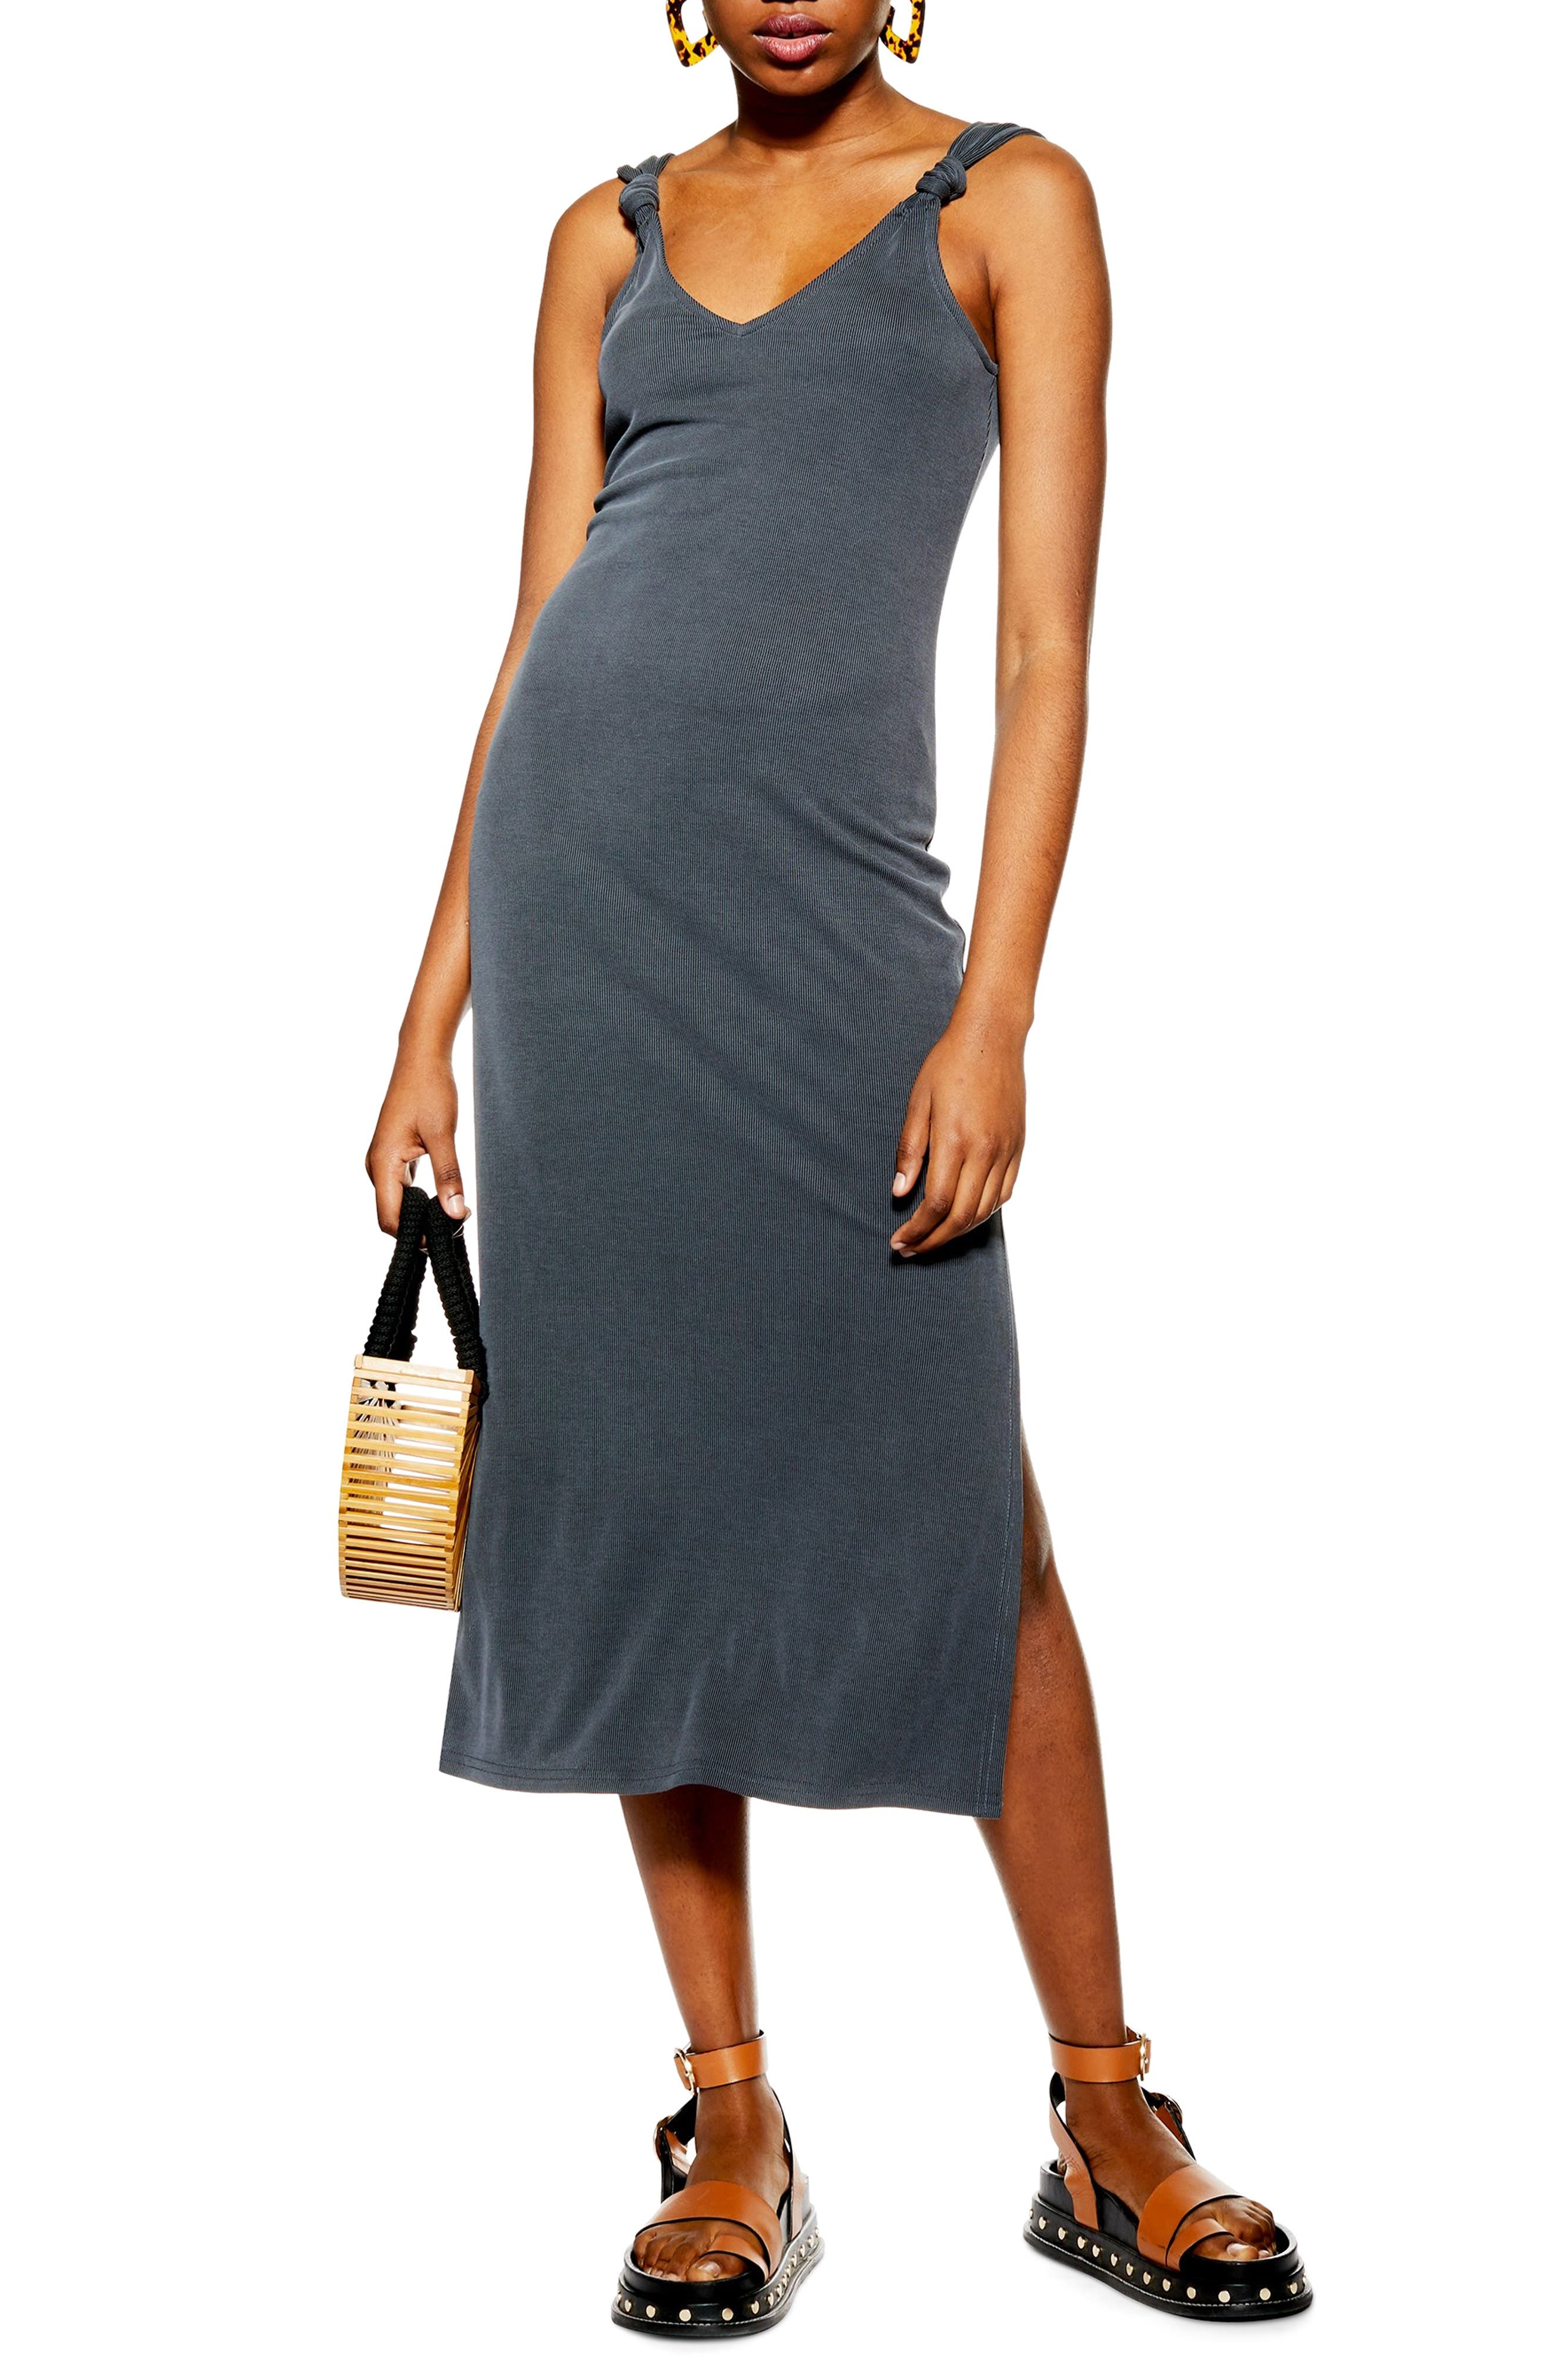 Topshop Midi Dress, US (fits like 0-2) - Blue